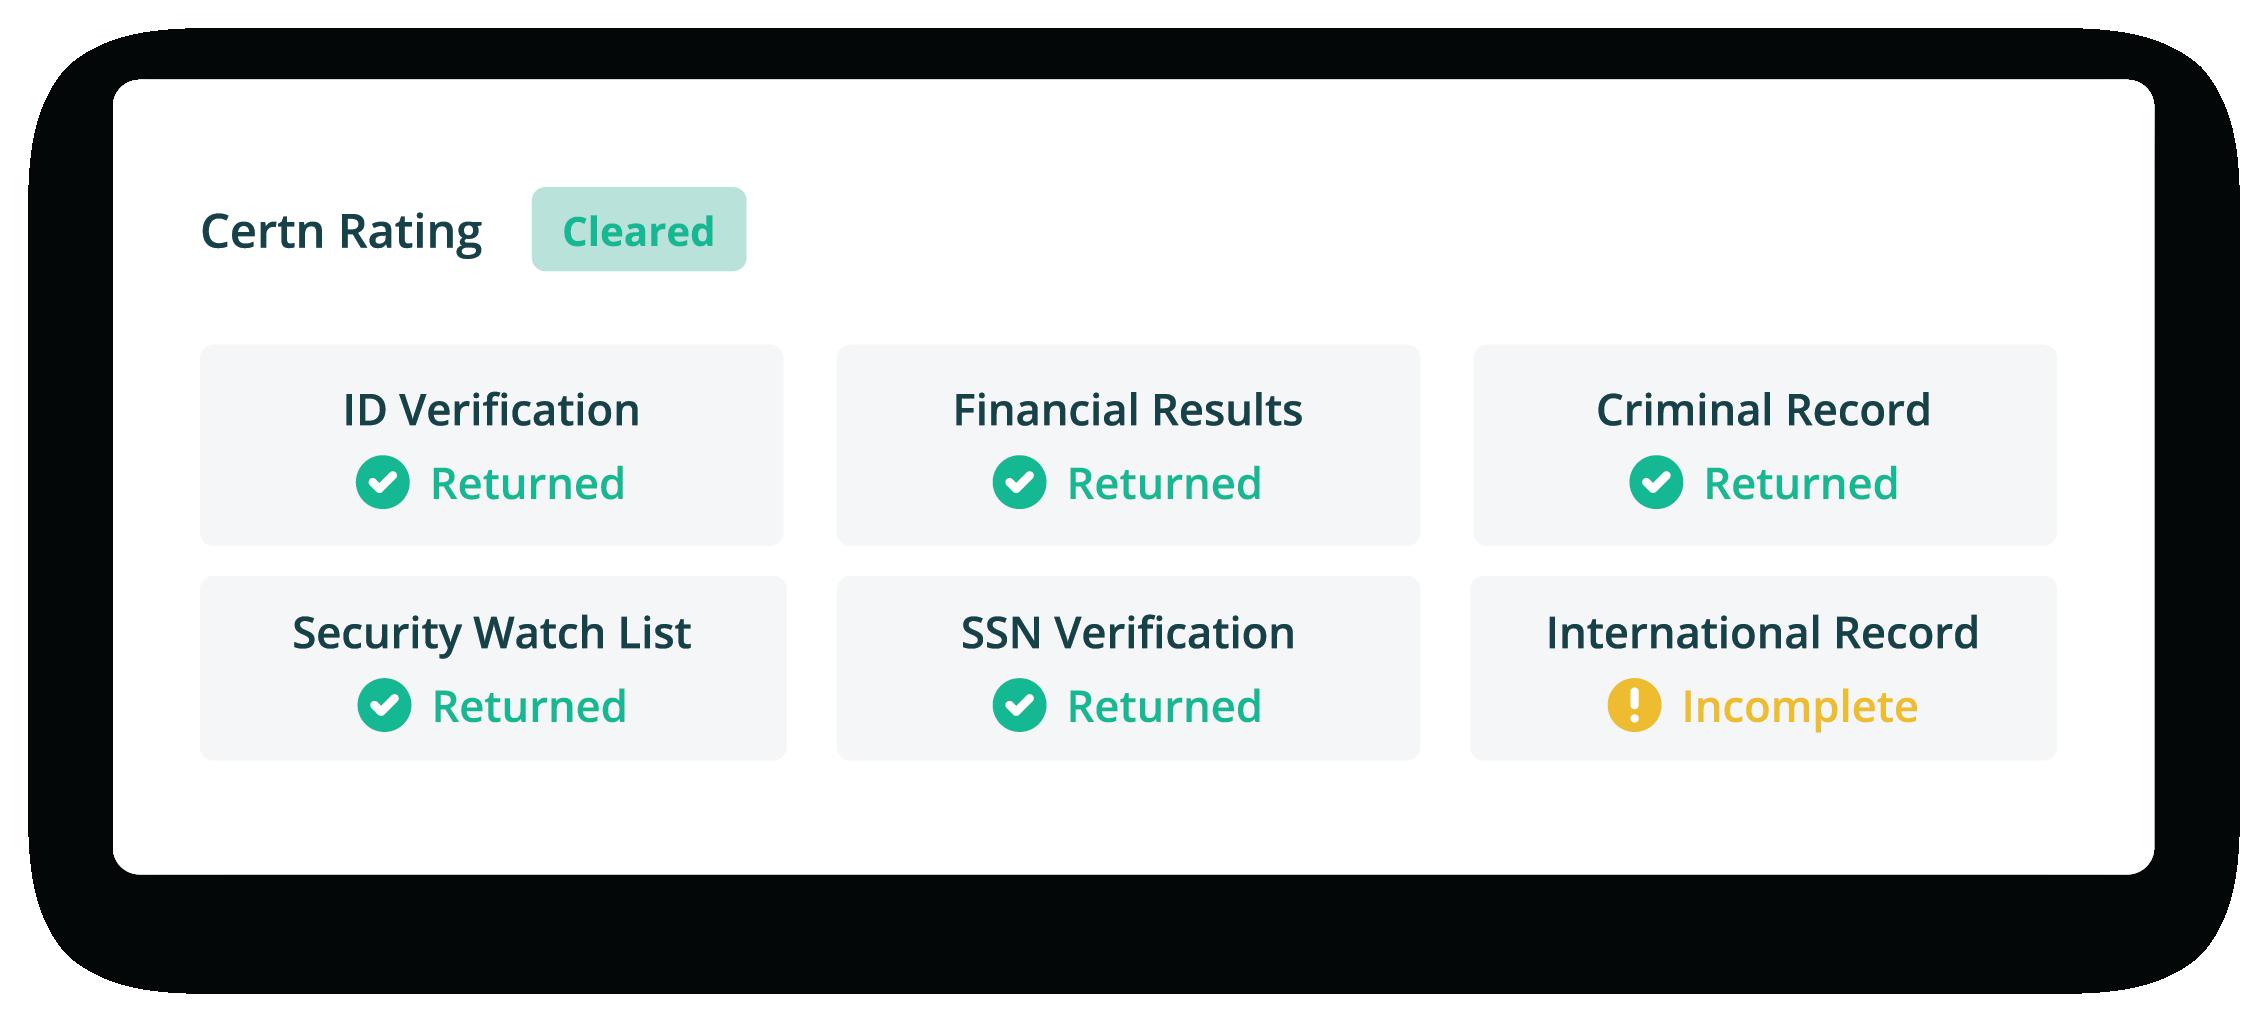 Credit certn rating